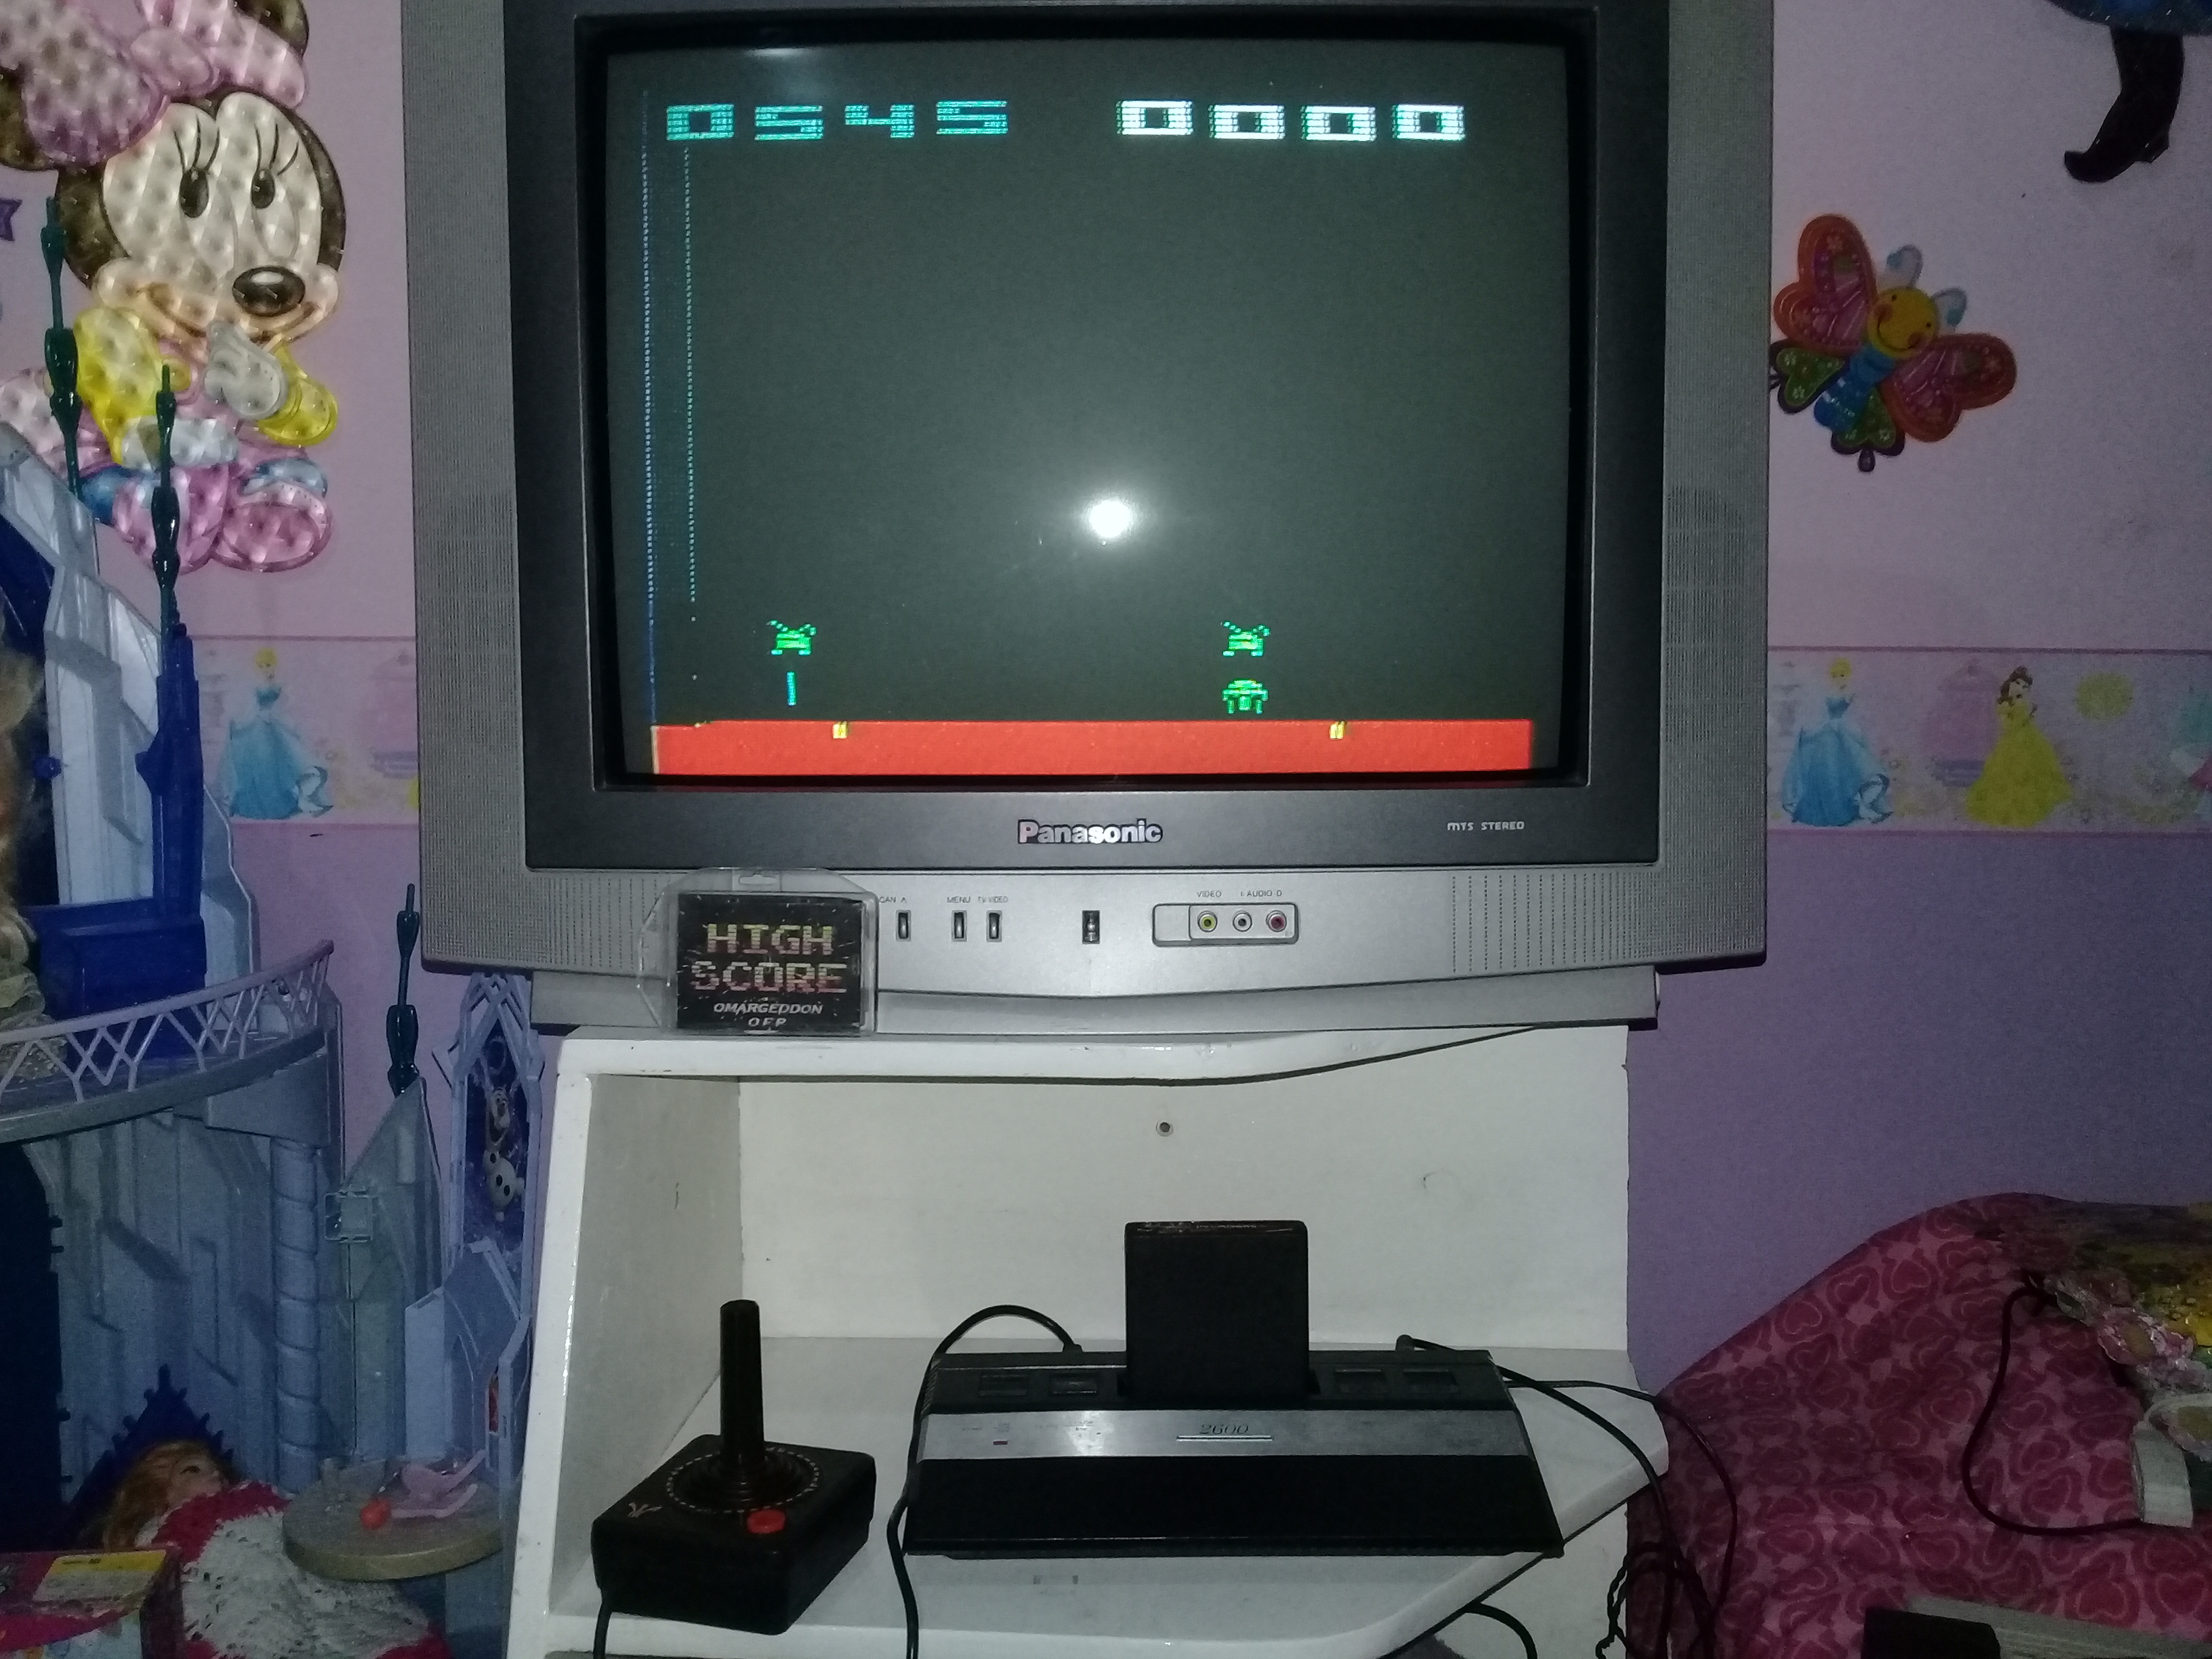 omargeddon: Space Invaders: Game 16 (Atari 2600 Novice/B) 545 points on 2019-05-22 20:09:18